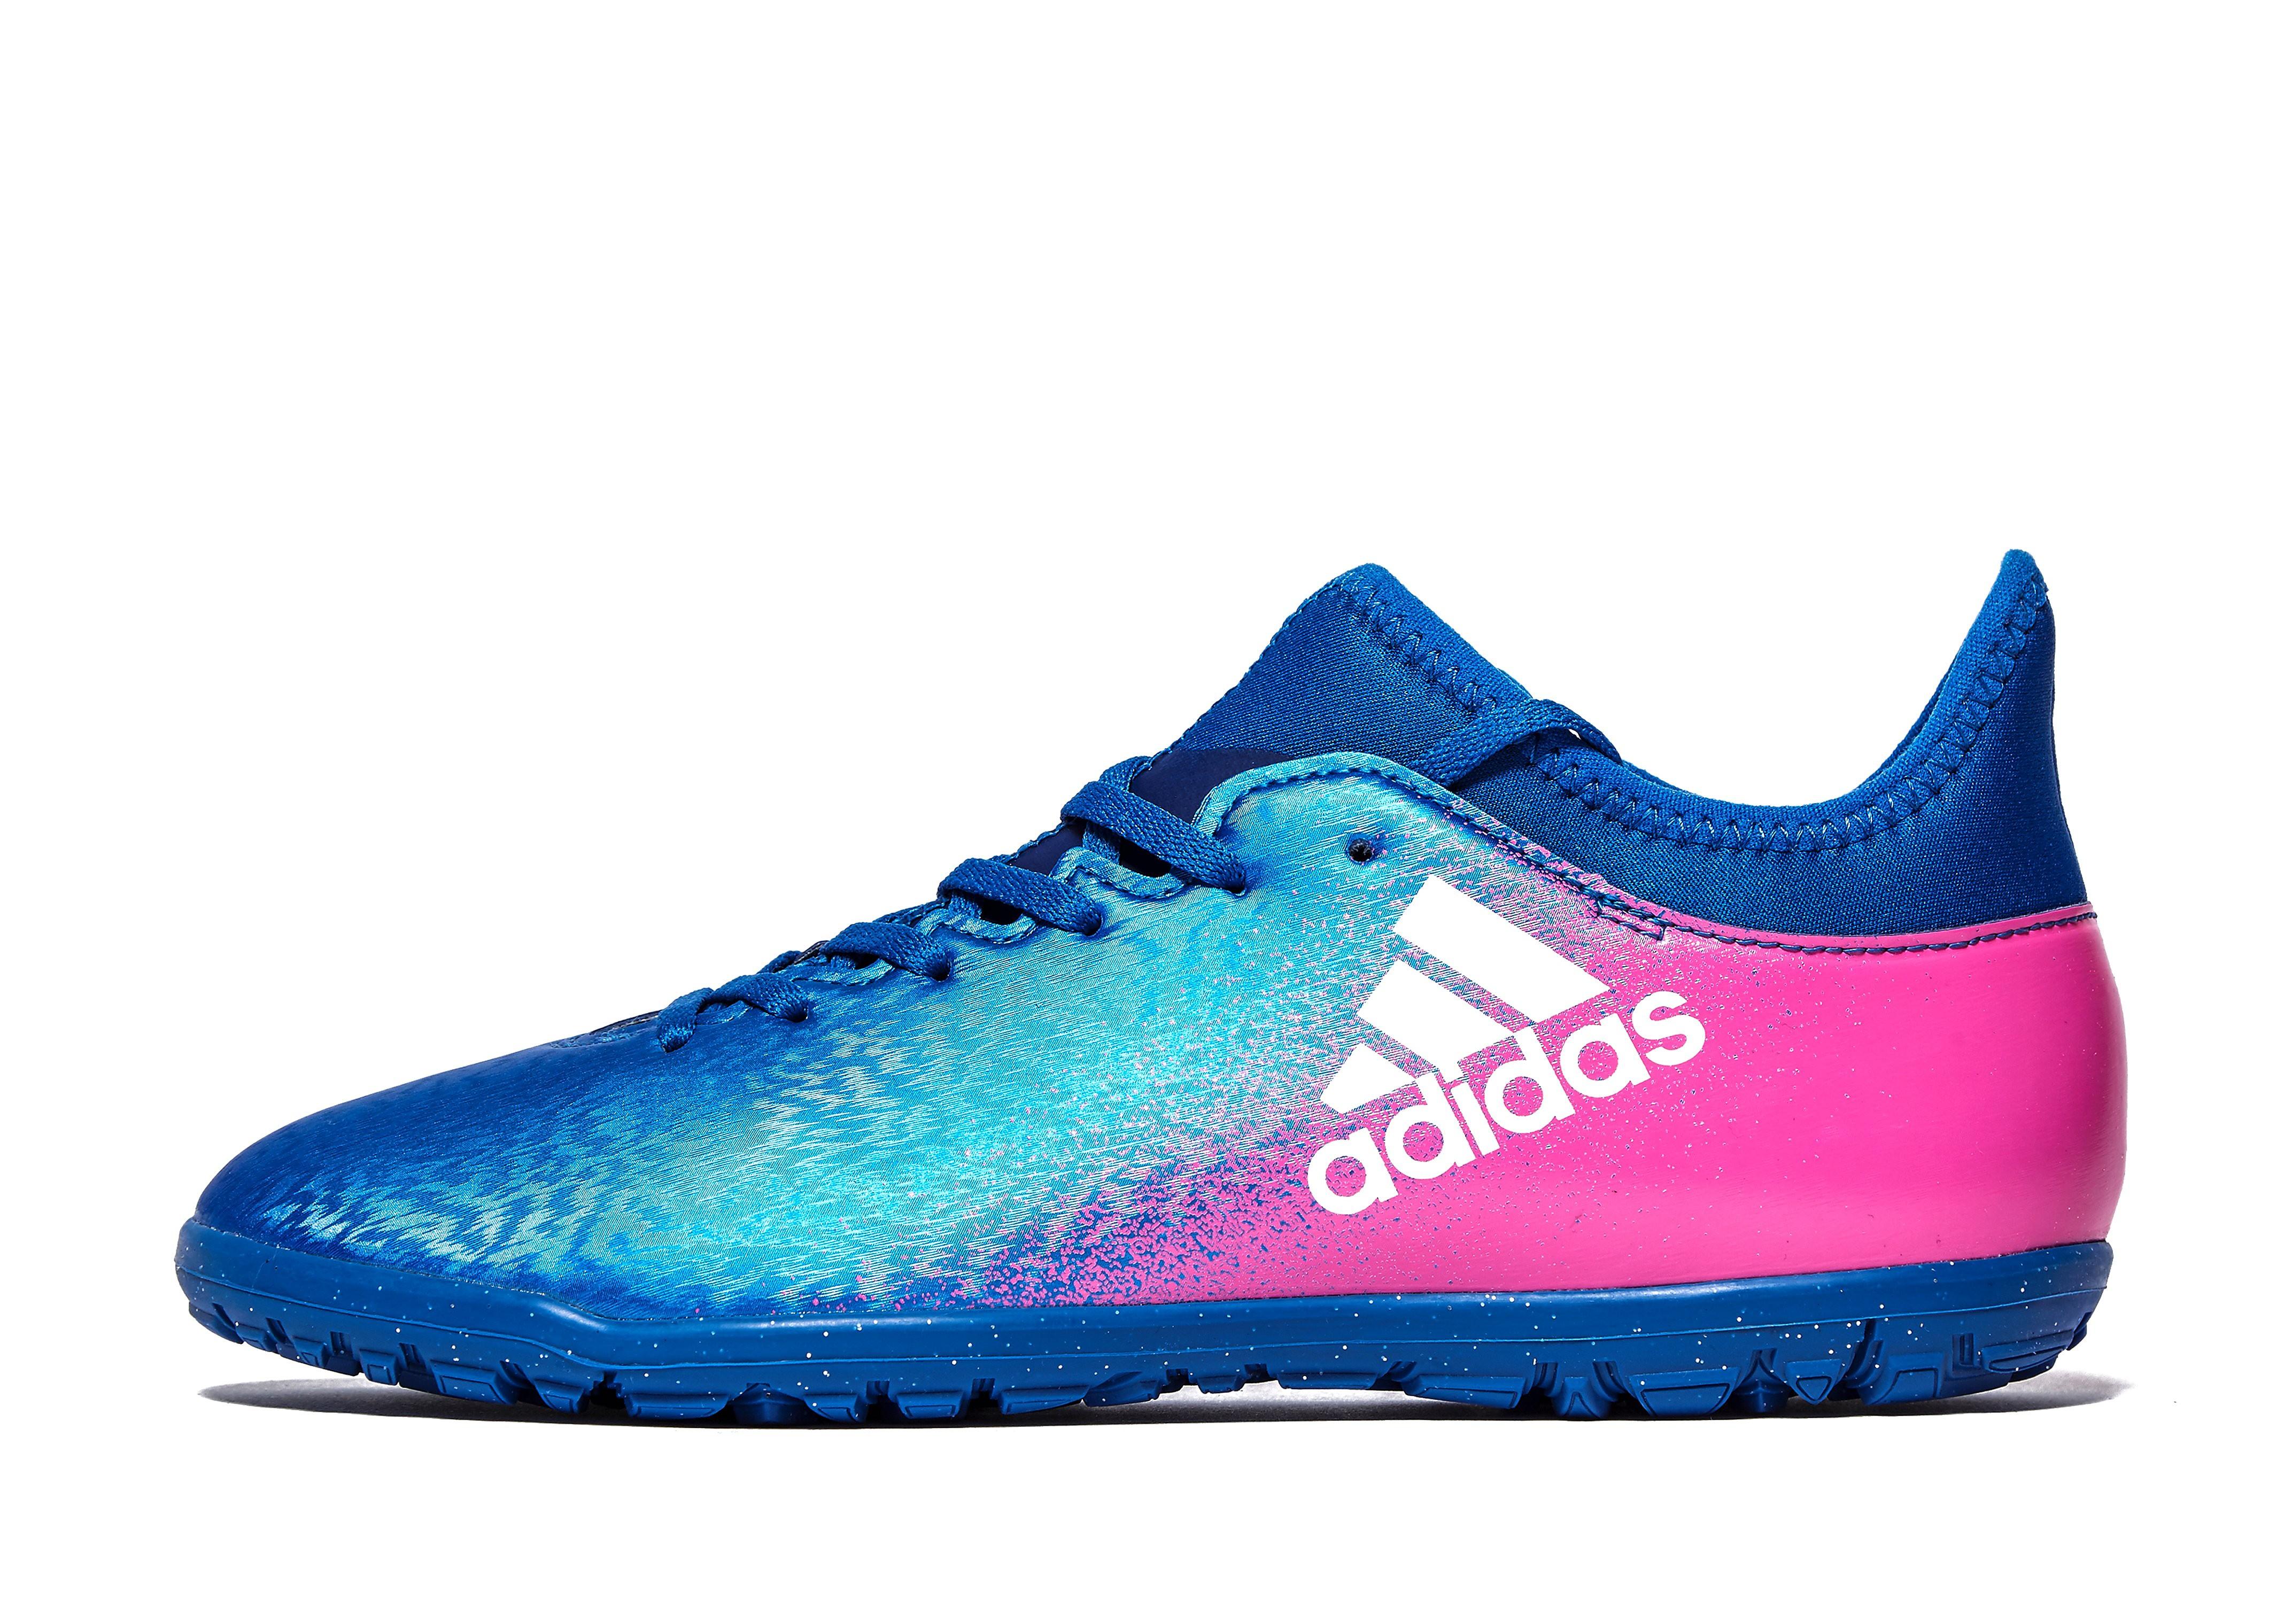 adidas Blue Blast X 16.3 TF Junior